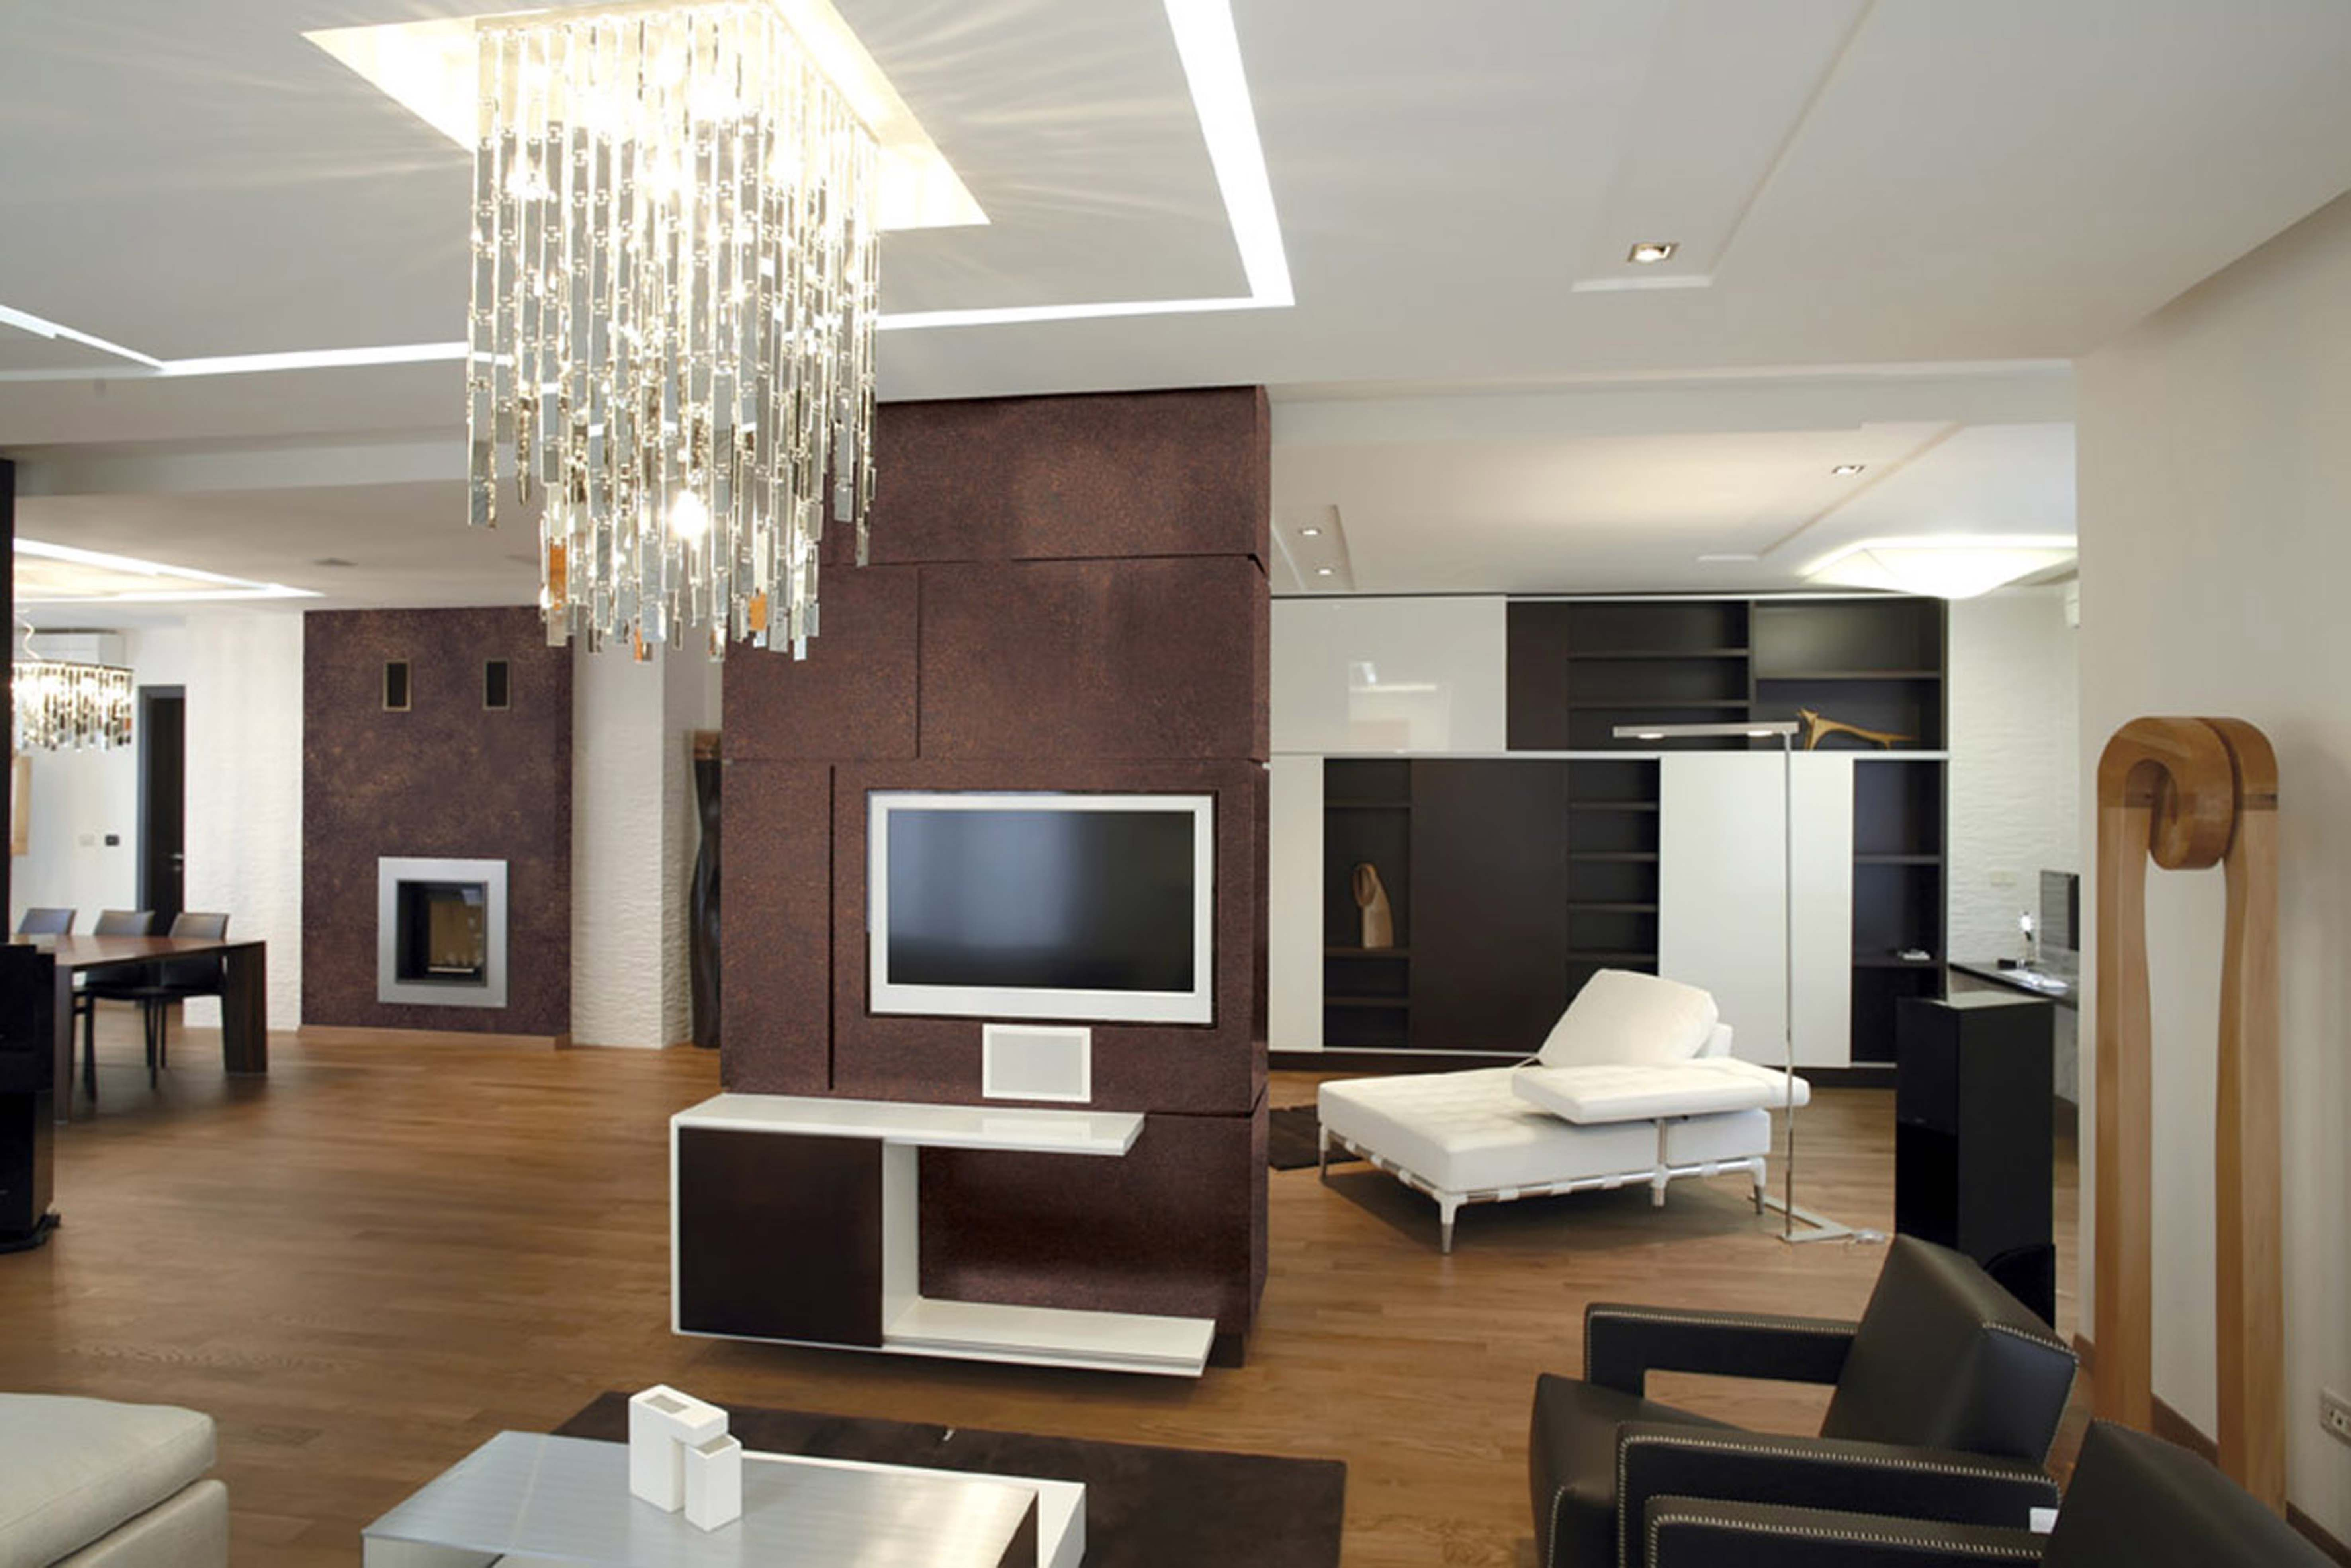 Decoracion moderno sala de estar dibujos muebles de for Muebles de sala de estar modernos